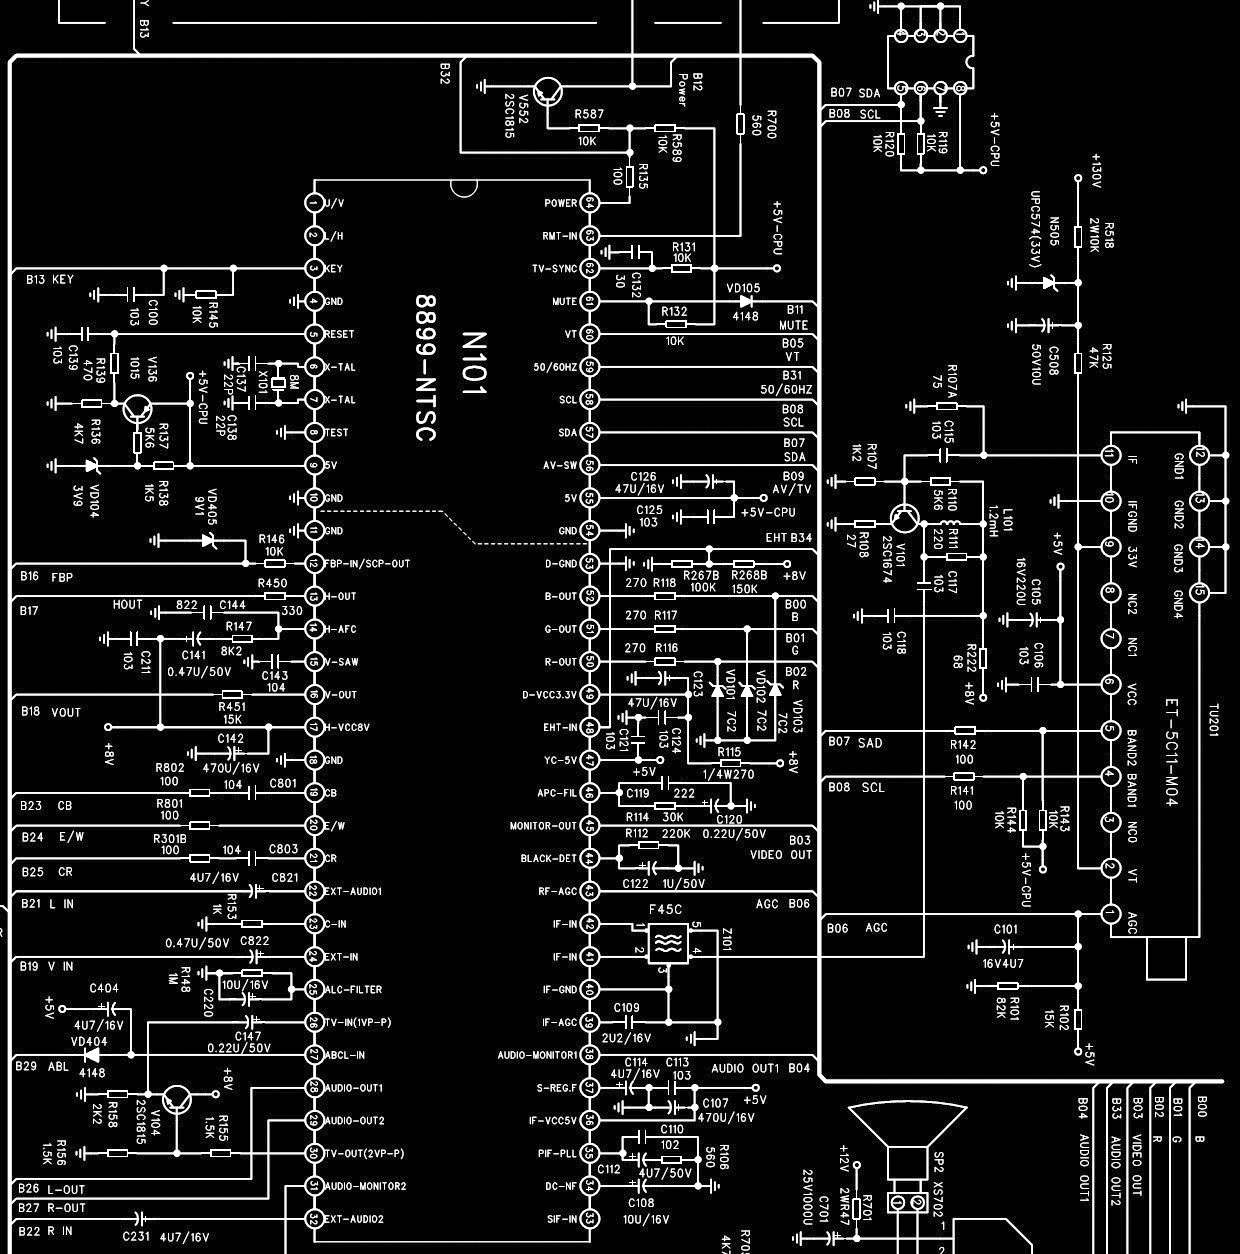 circuit diagram click on the circuit diagram to magnify  [ 1240 x 1254 Pixel ]